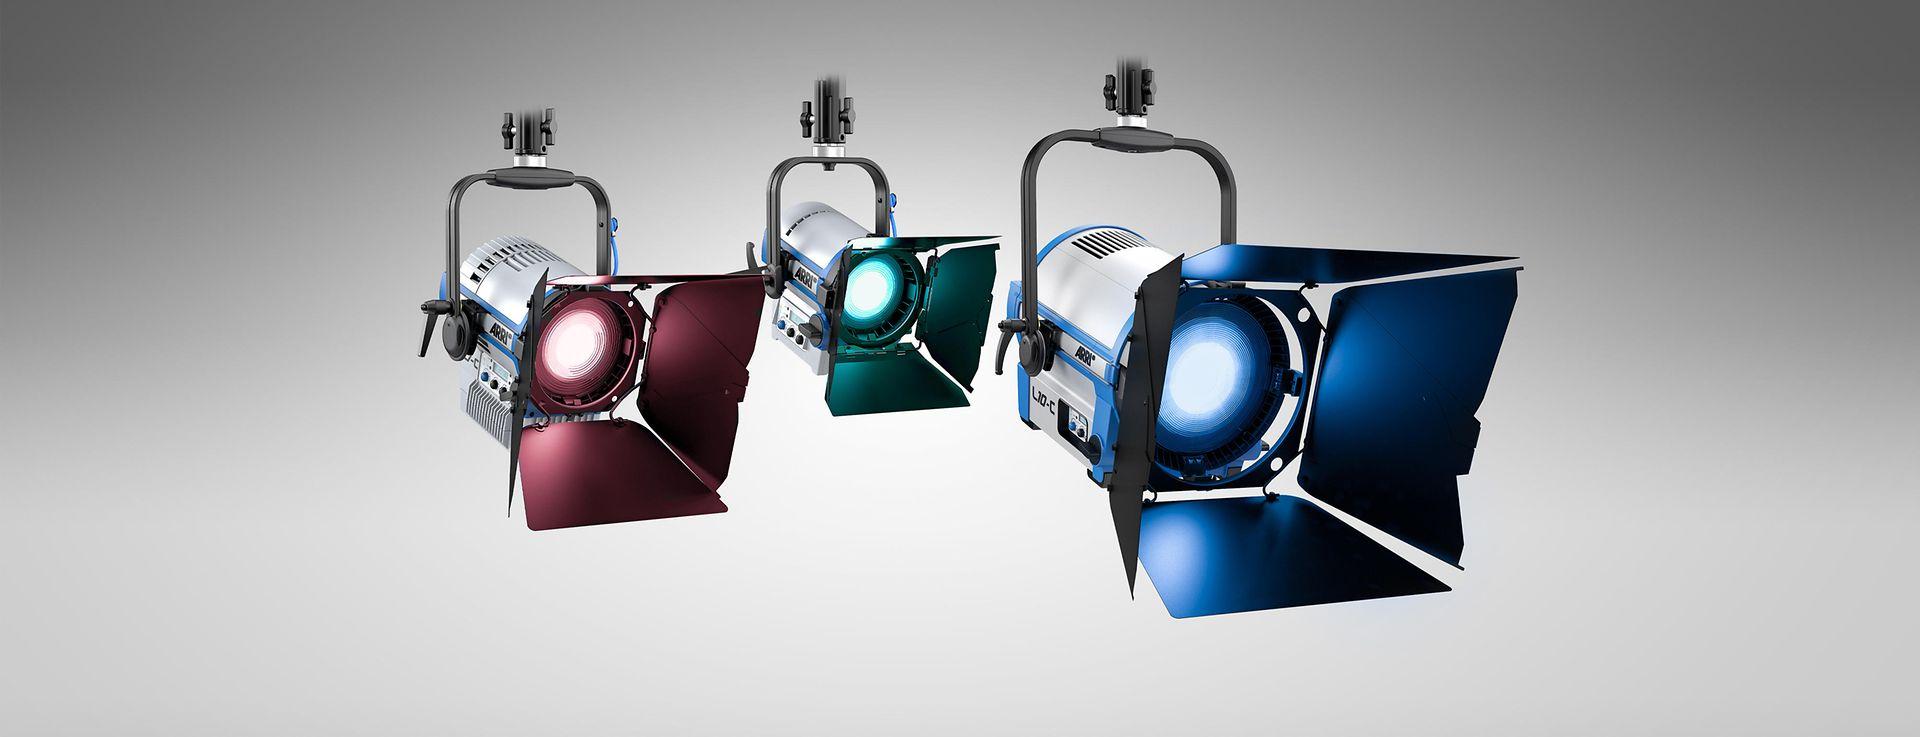 lighting-equipment-hire